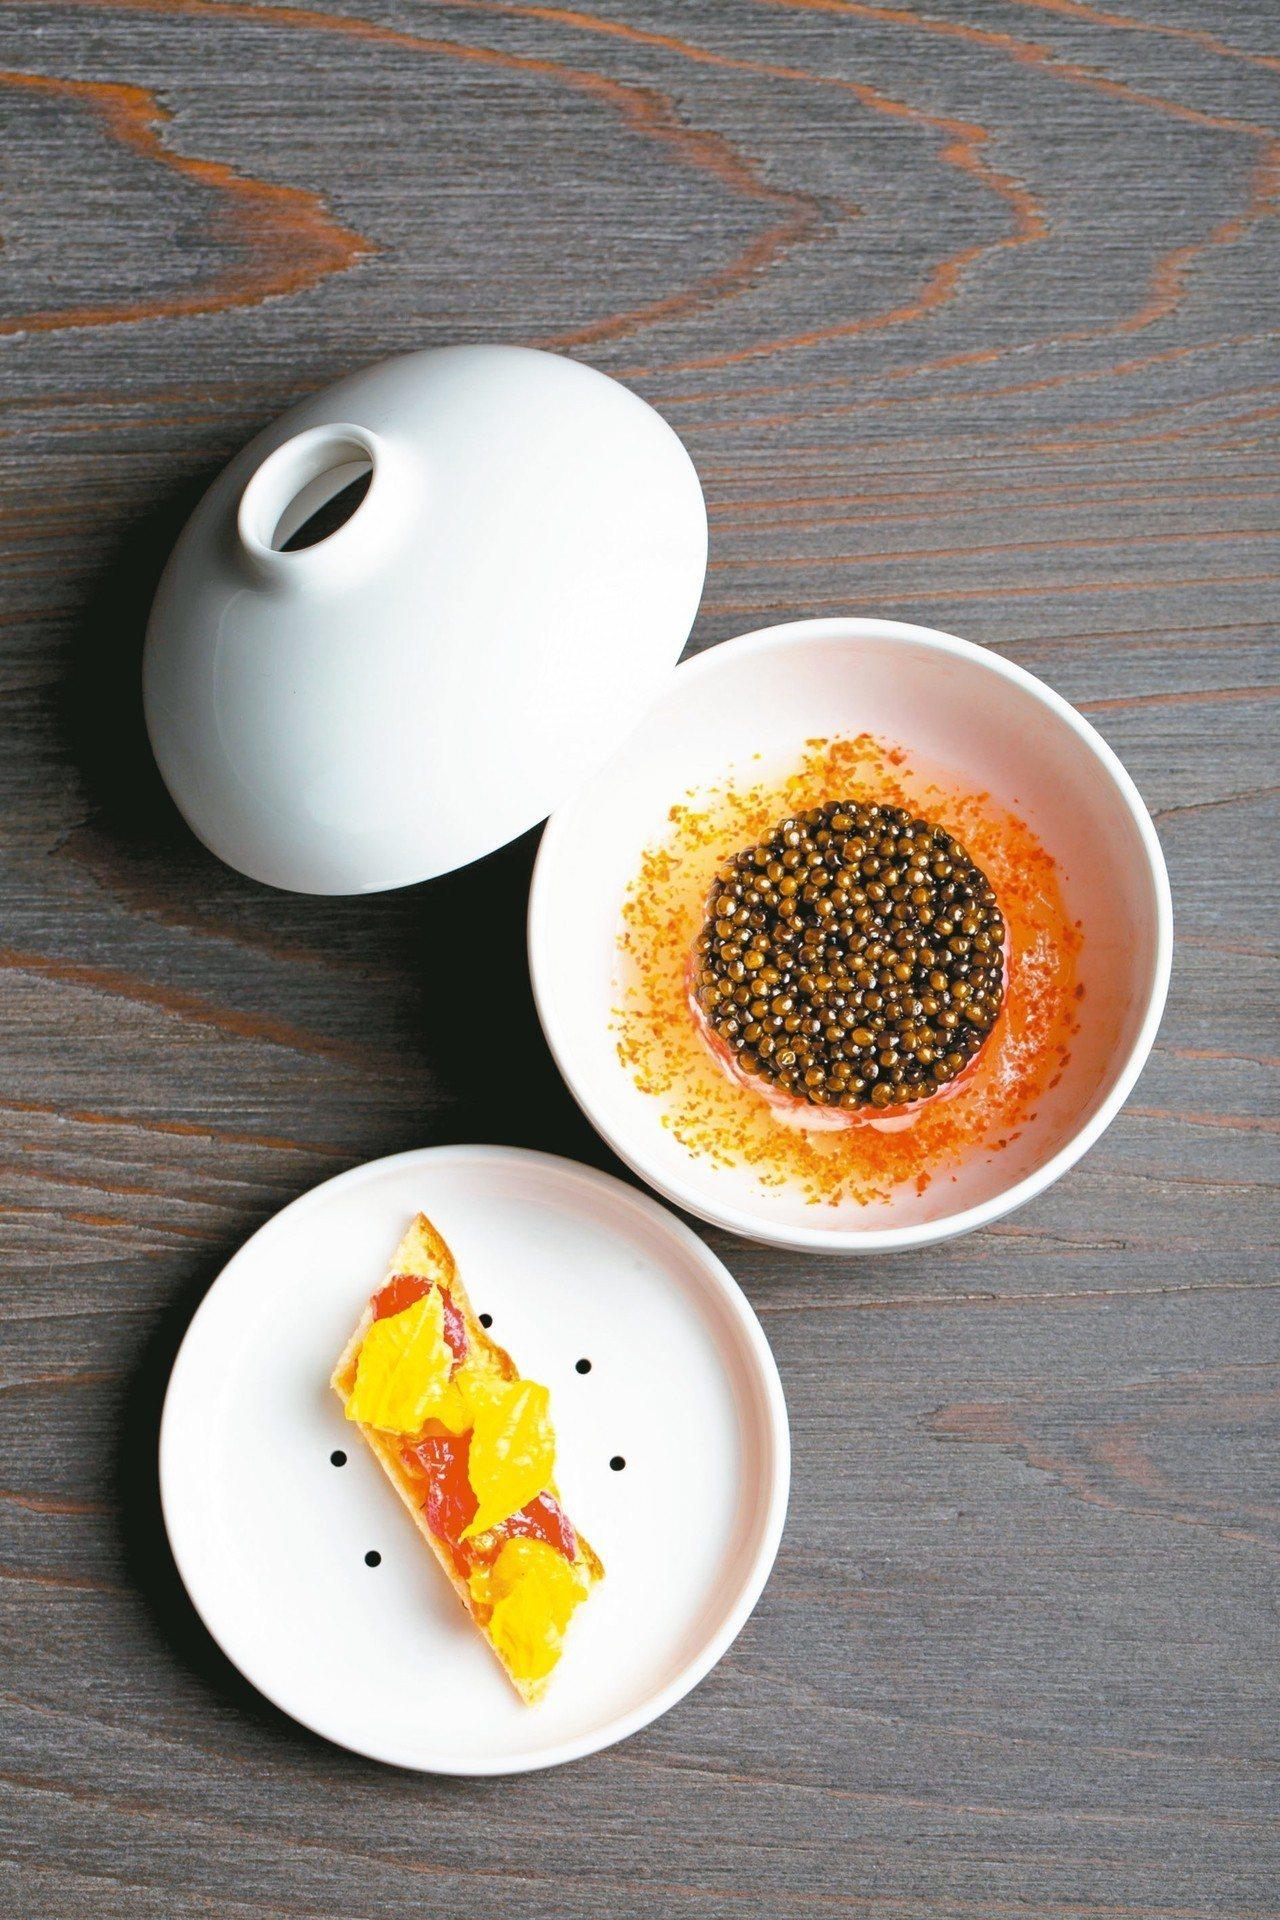 Wilfrid Hocquet用台灣小番茄搭配魚子醬、帝王蟹等製作的前菜,並大讚...